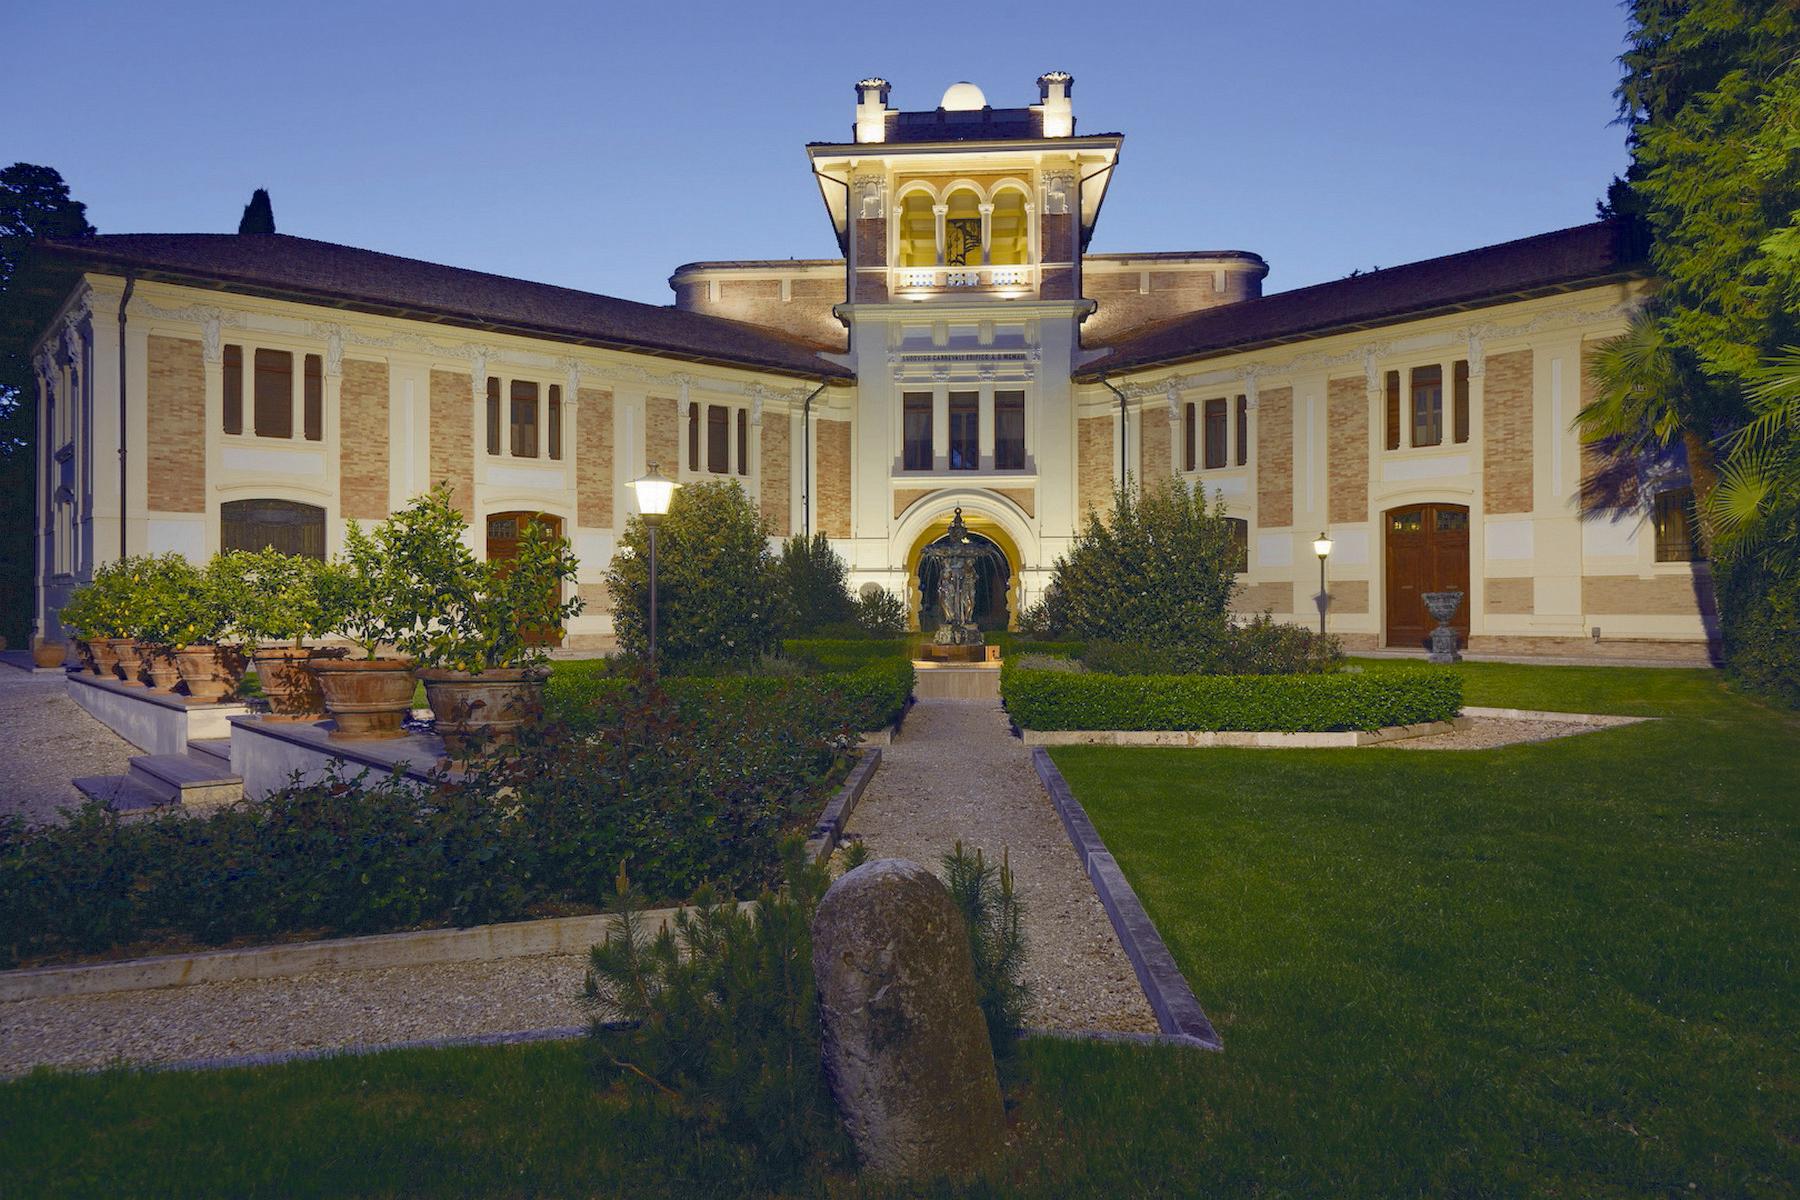 Additional photo for property listing at Villa Cardinali Contrada Schito Treia, Macerata 62010 Italia